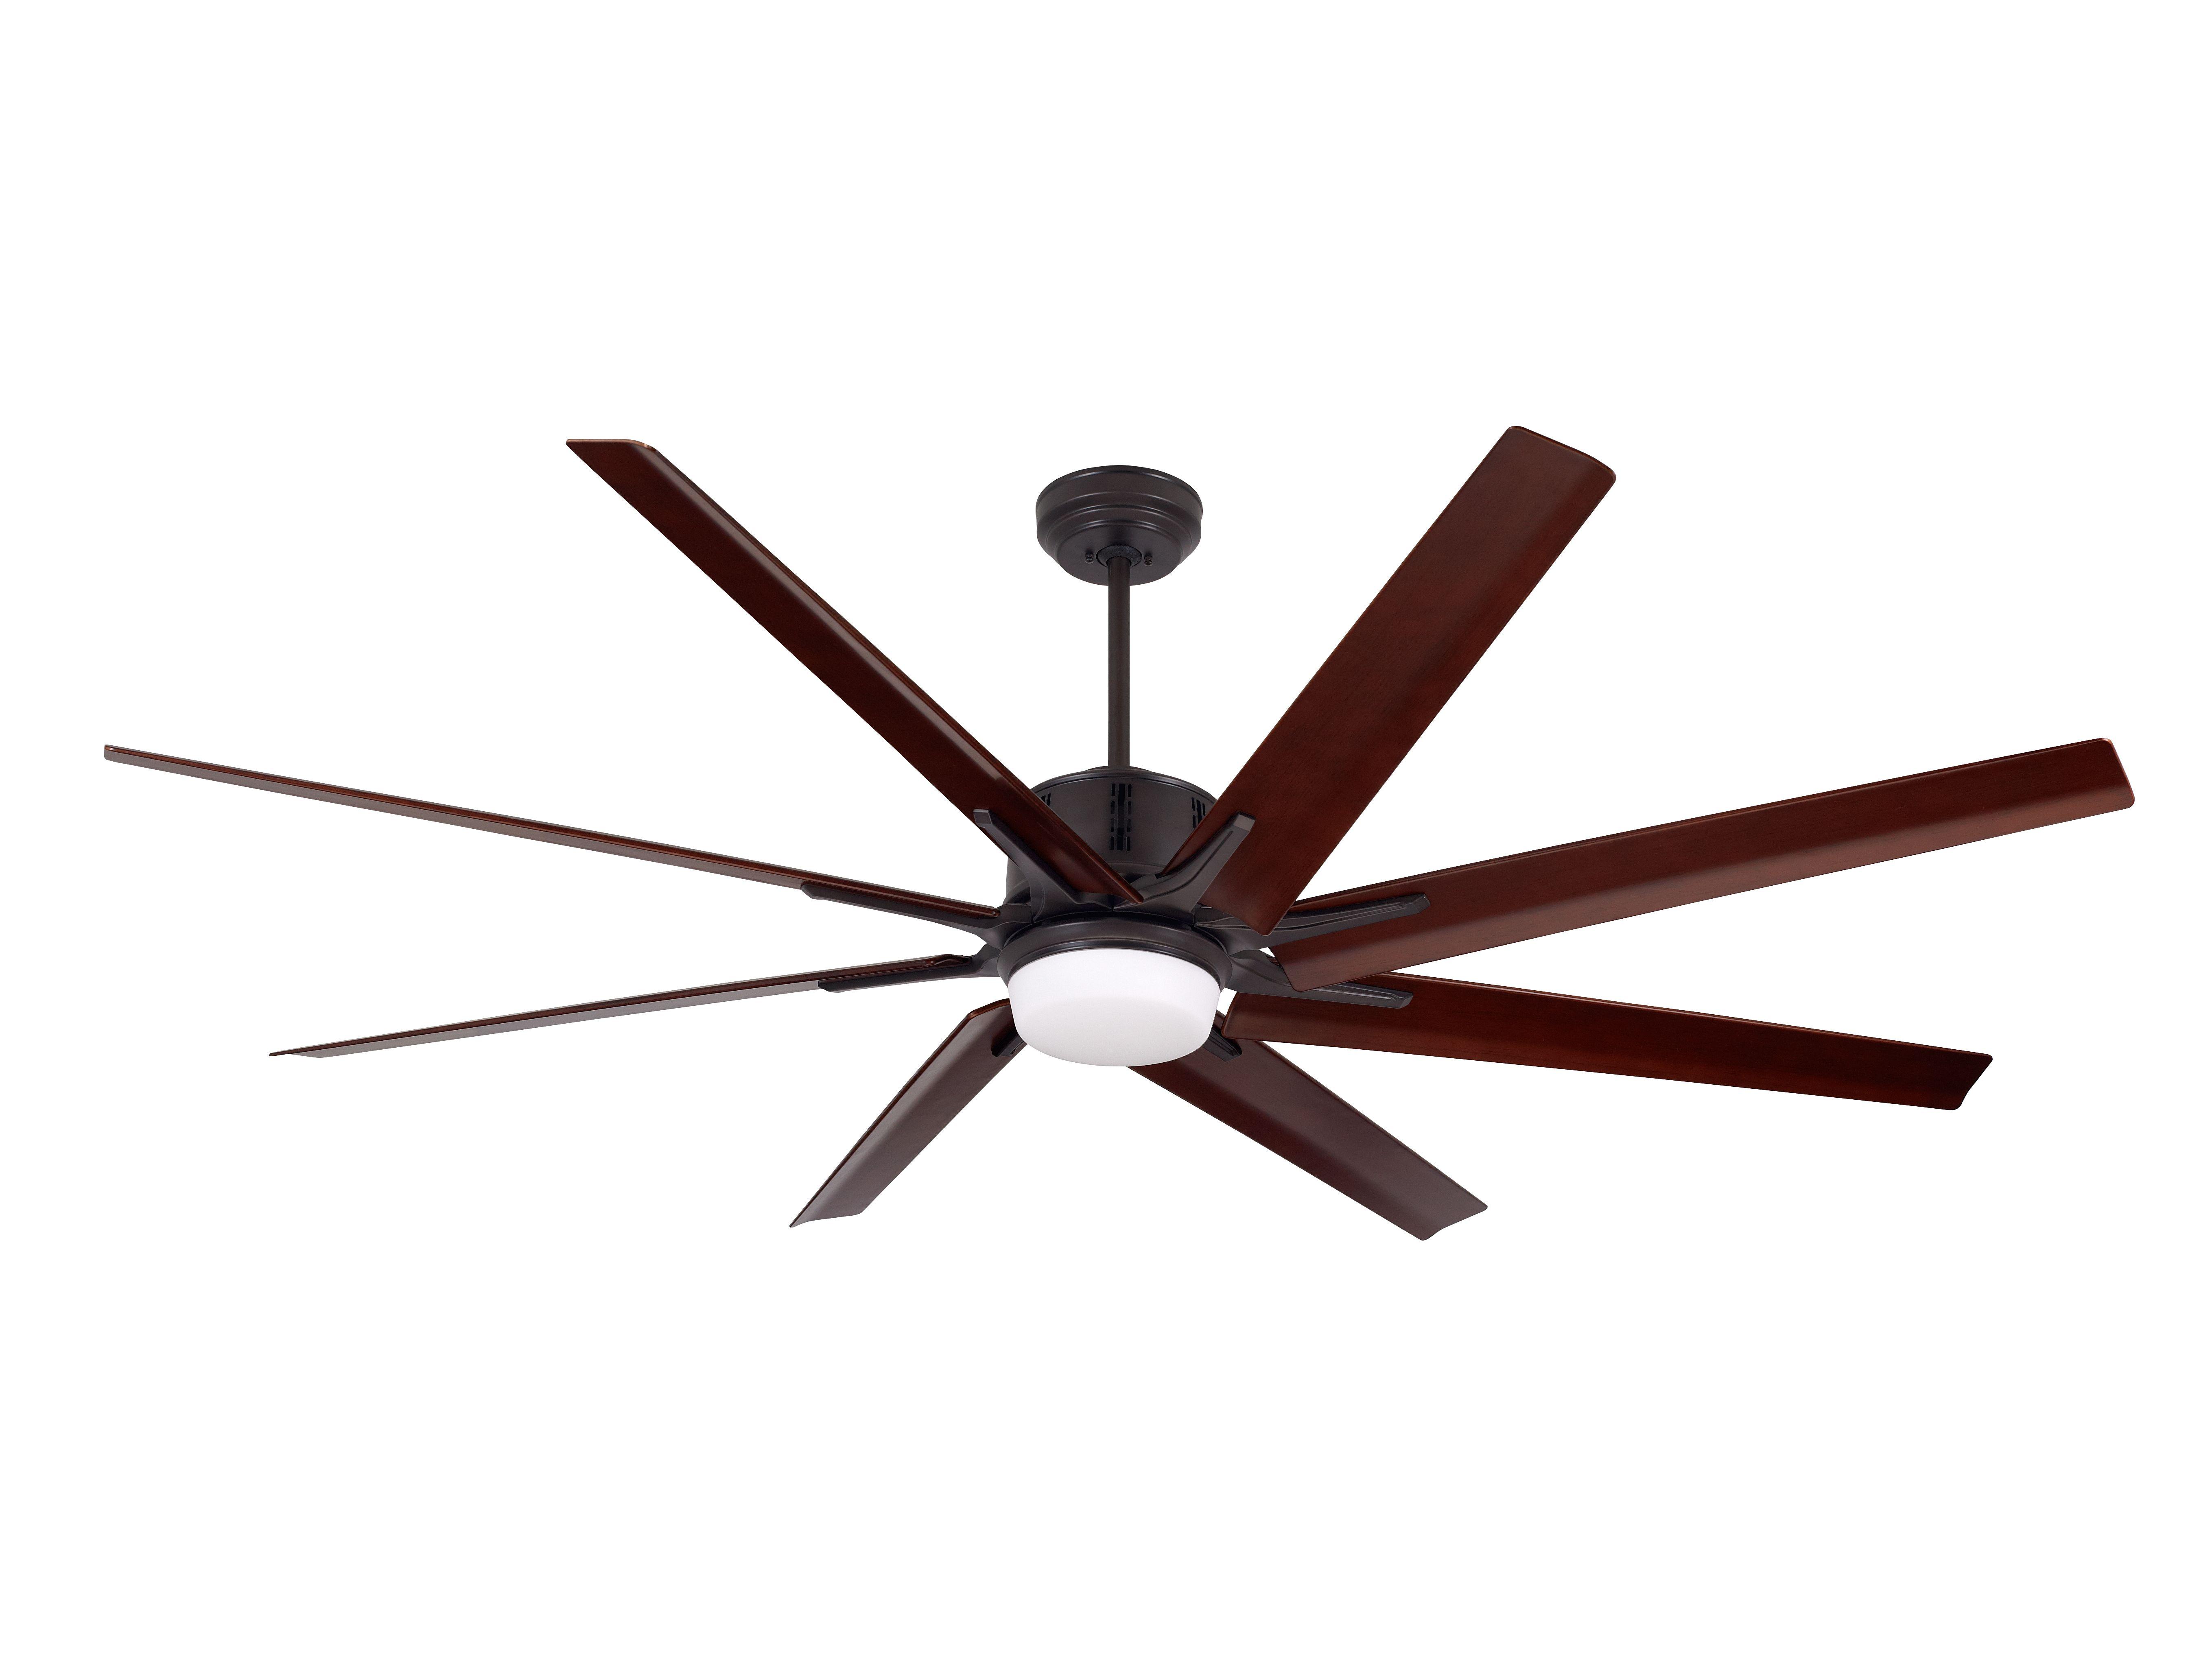 "Emerson Fans CF985ORB Aira Eco Oil Rubbed Bronze 72"" Ceiling Fan"